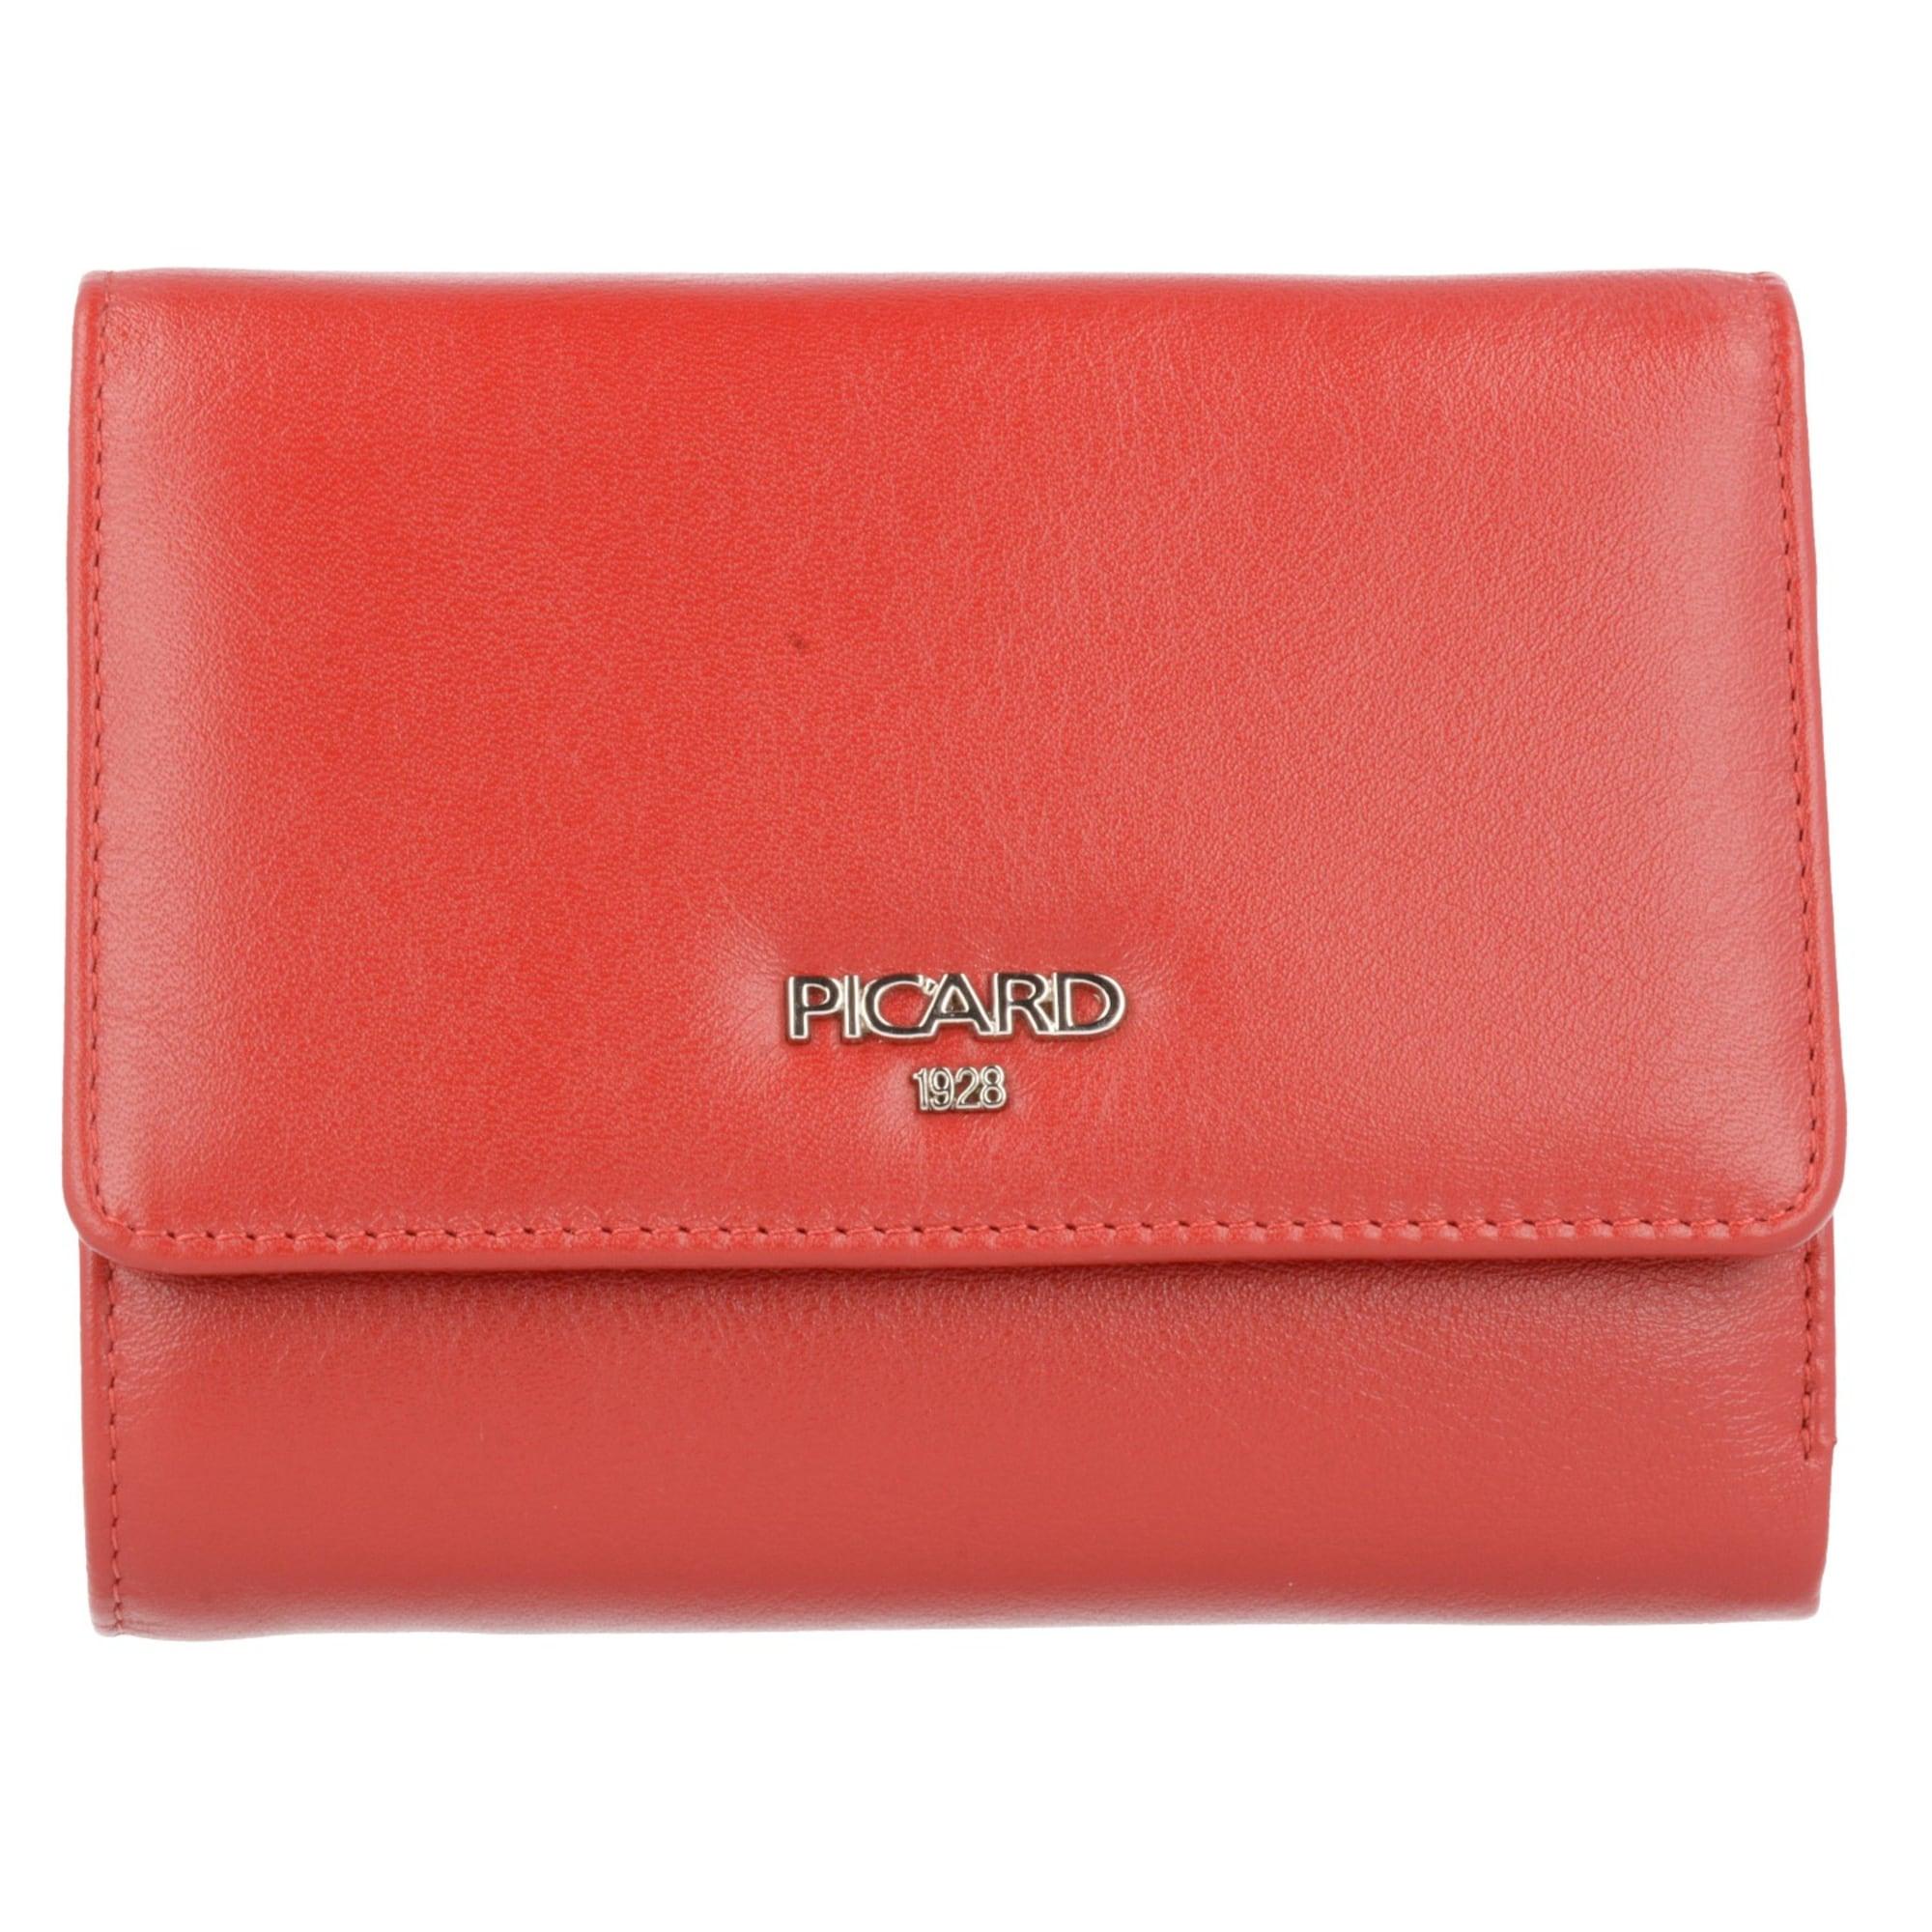 'Bingo' Geldbörse Damen Leder | Accessoires > Portemonnaies > Geldbörsen | Picard